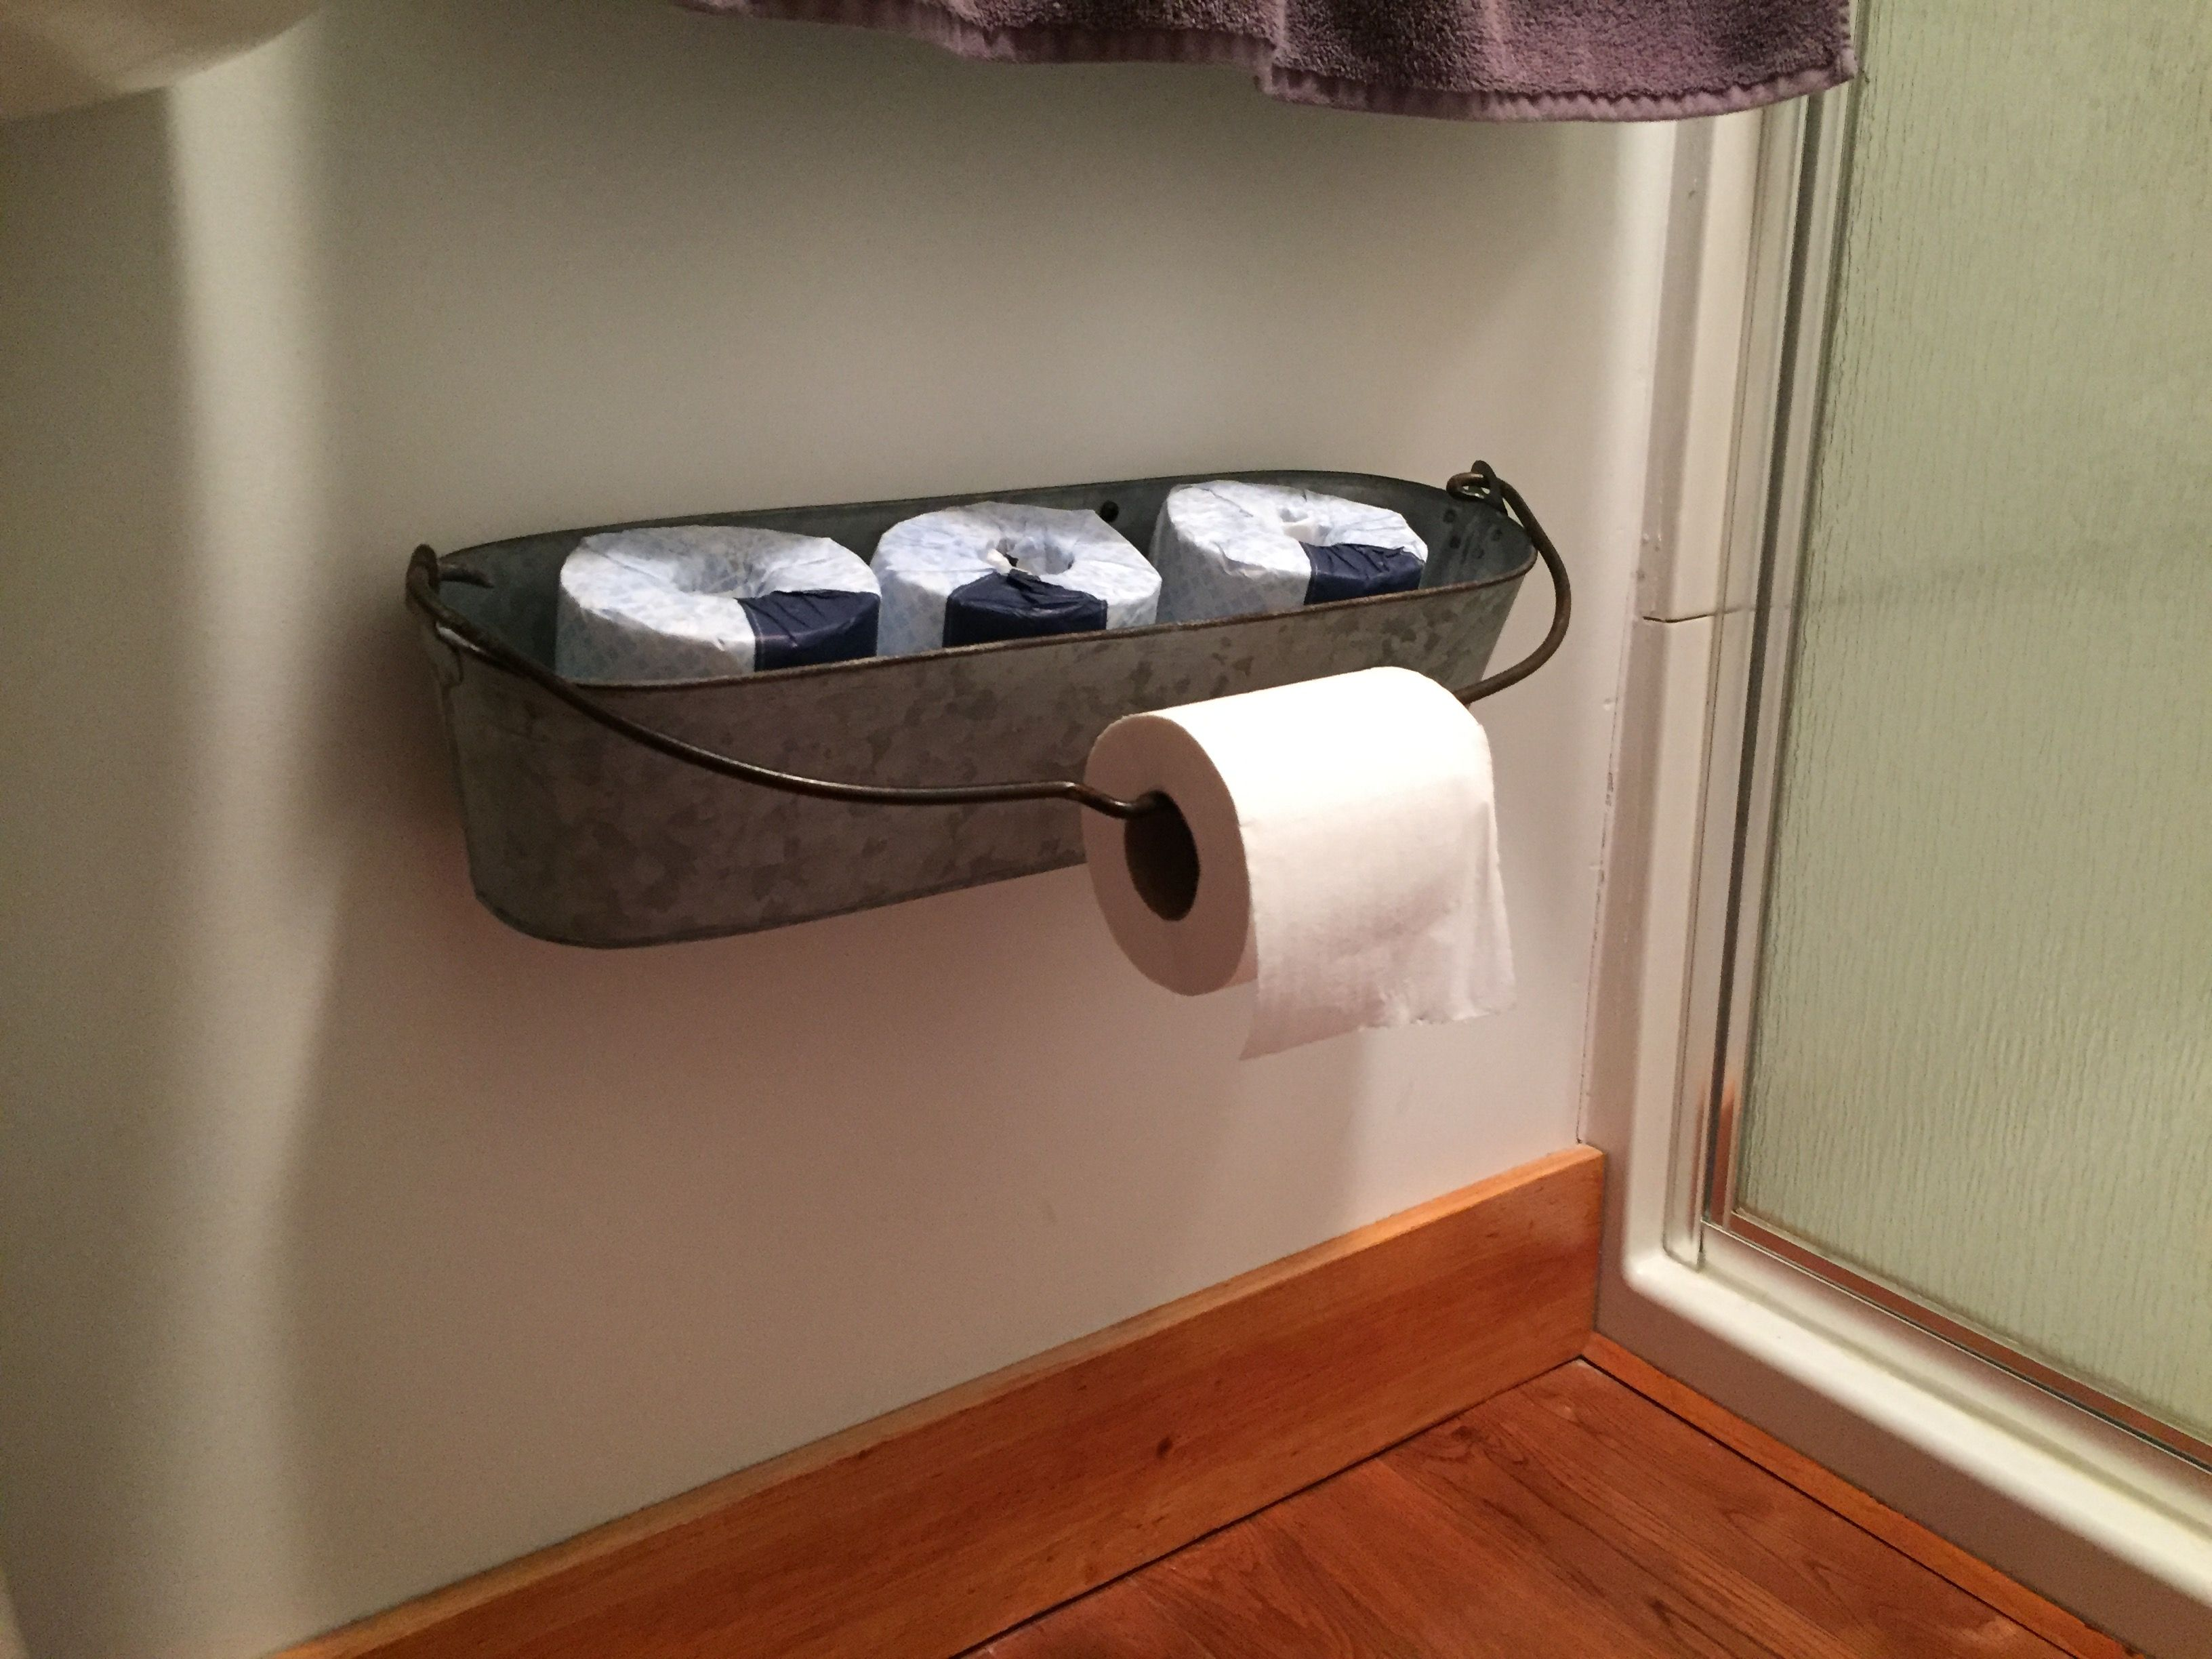 Rustic toilet paper holder